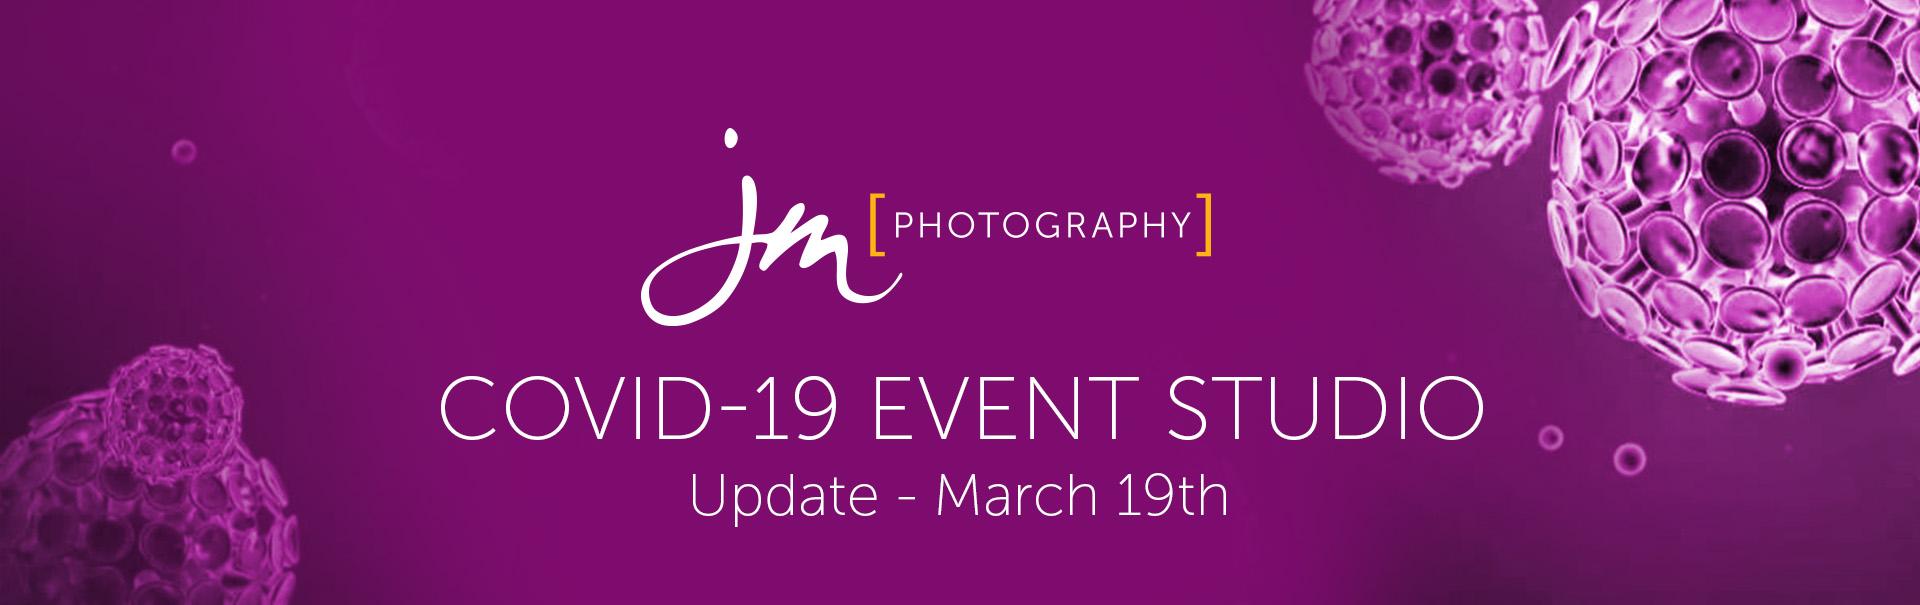 covid-19-coronavirus-jm_photography-event-studio-update-20200319